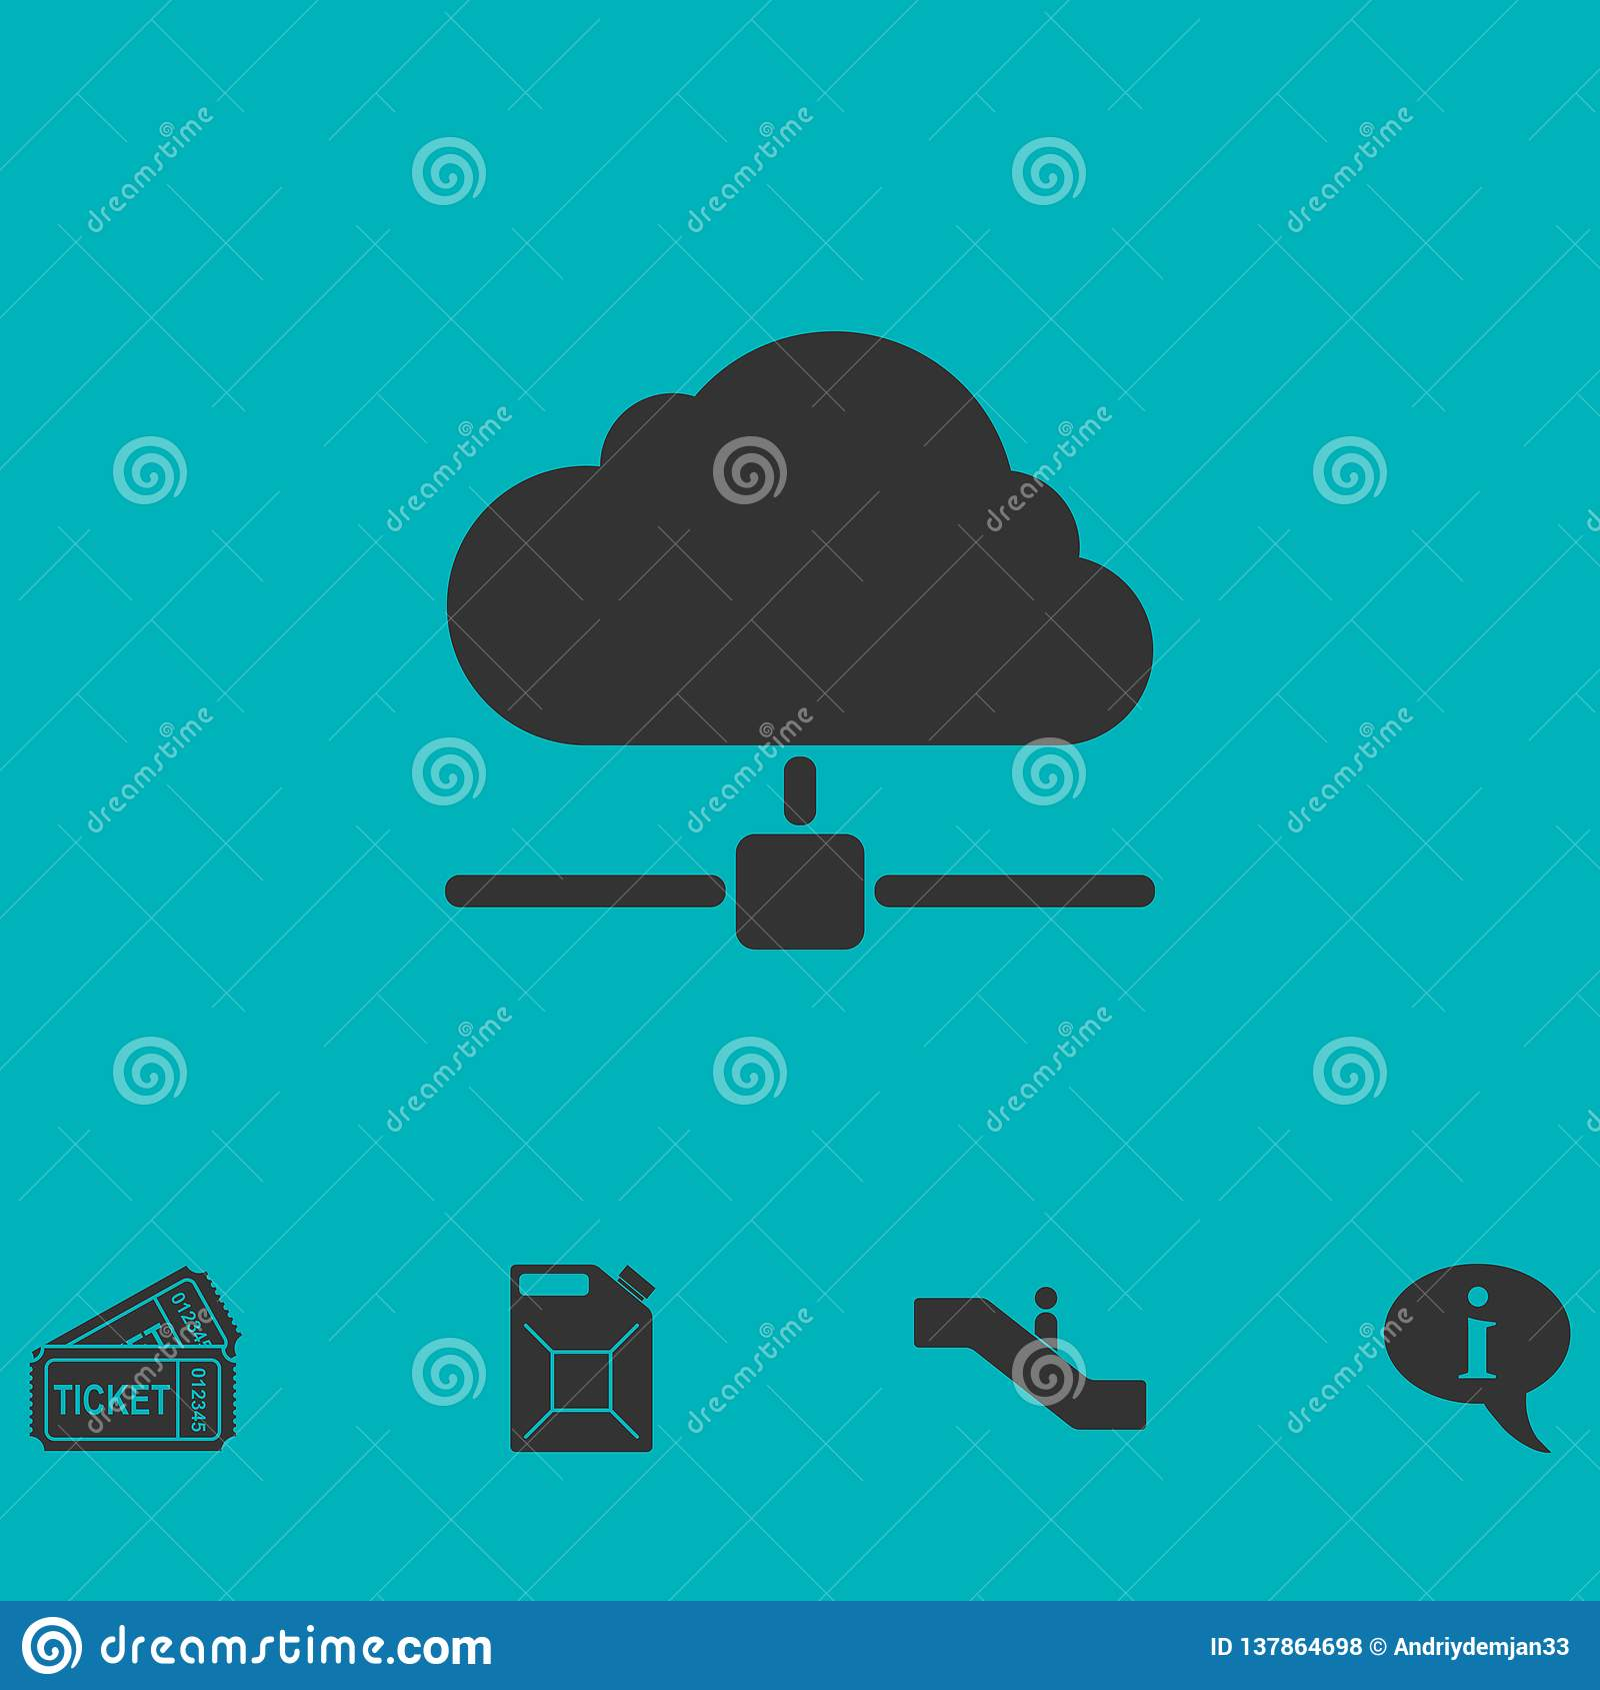 Cloud computing,server icon flat